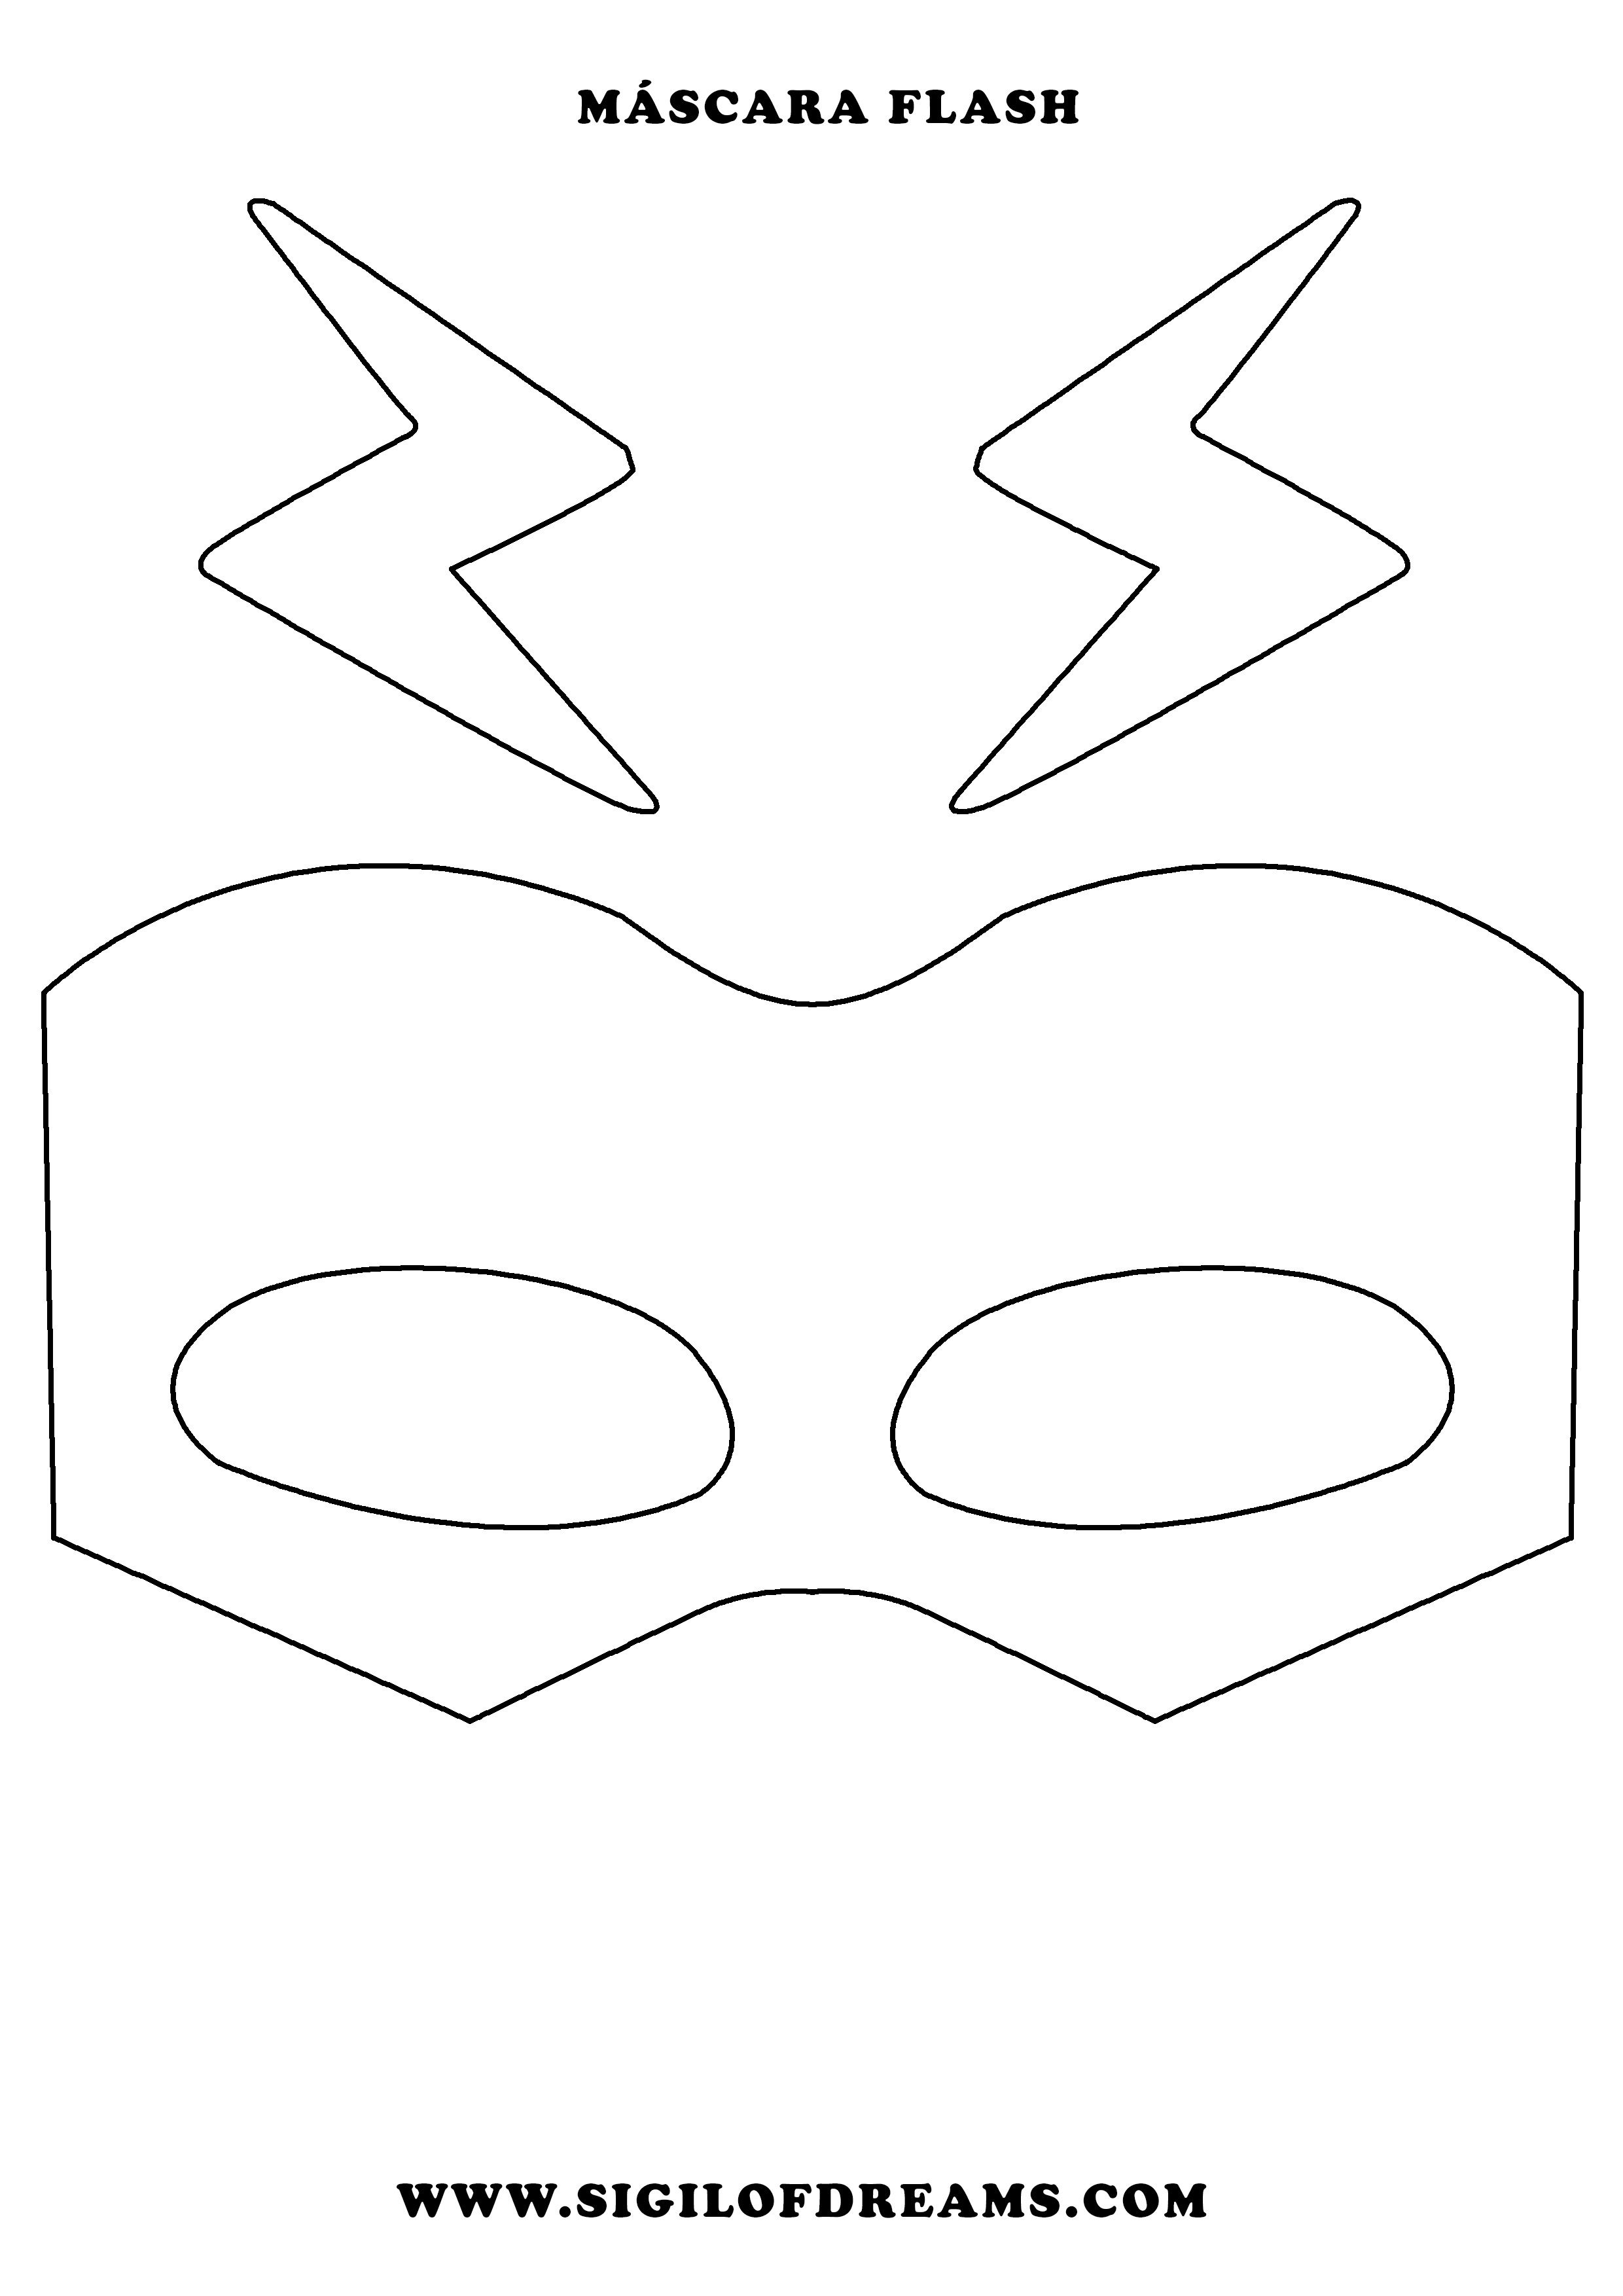 Máscara de Flash para imprimir. #Flash #Mask #Mascara #superheroe ...